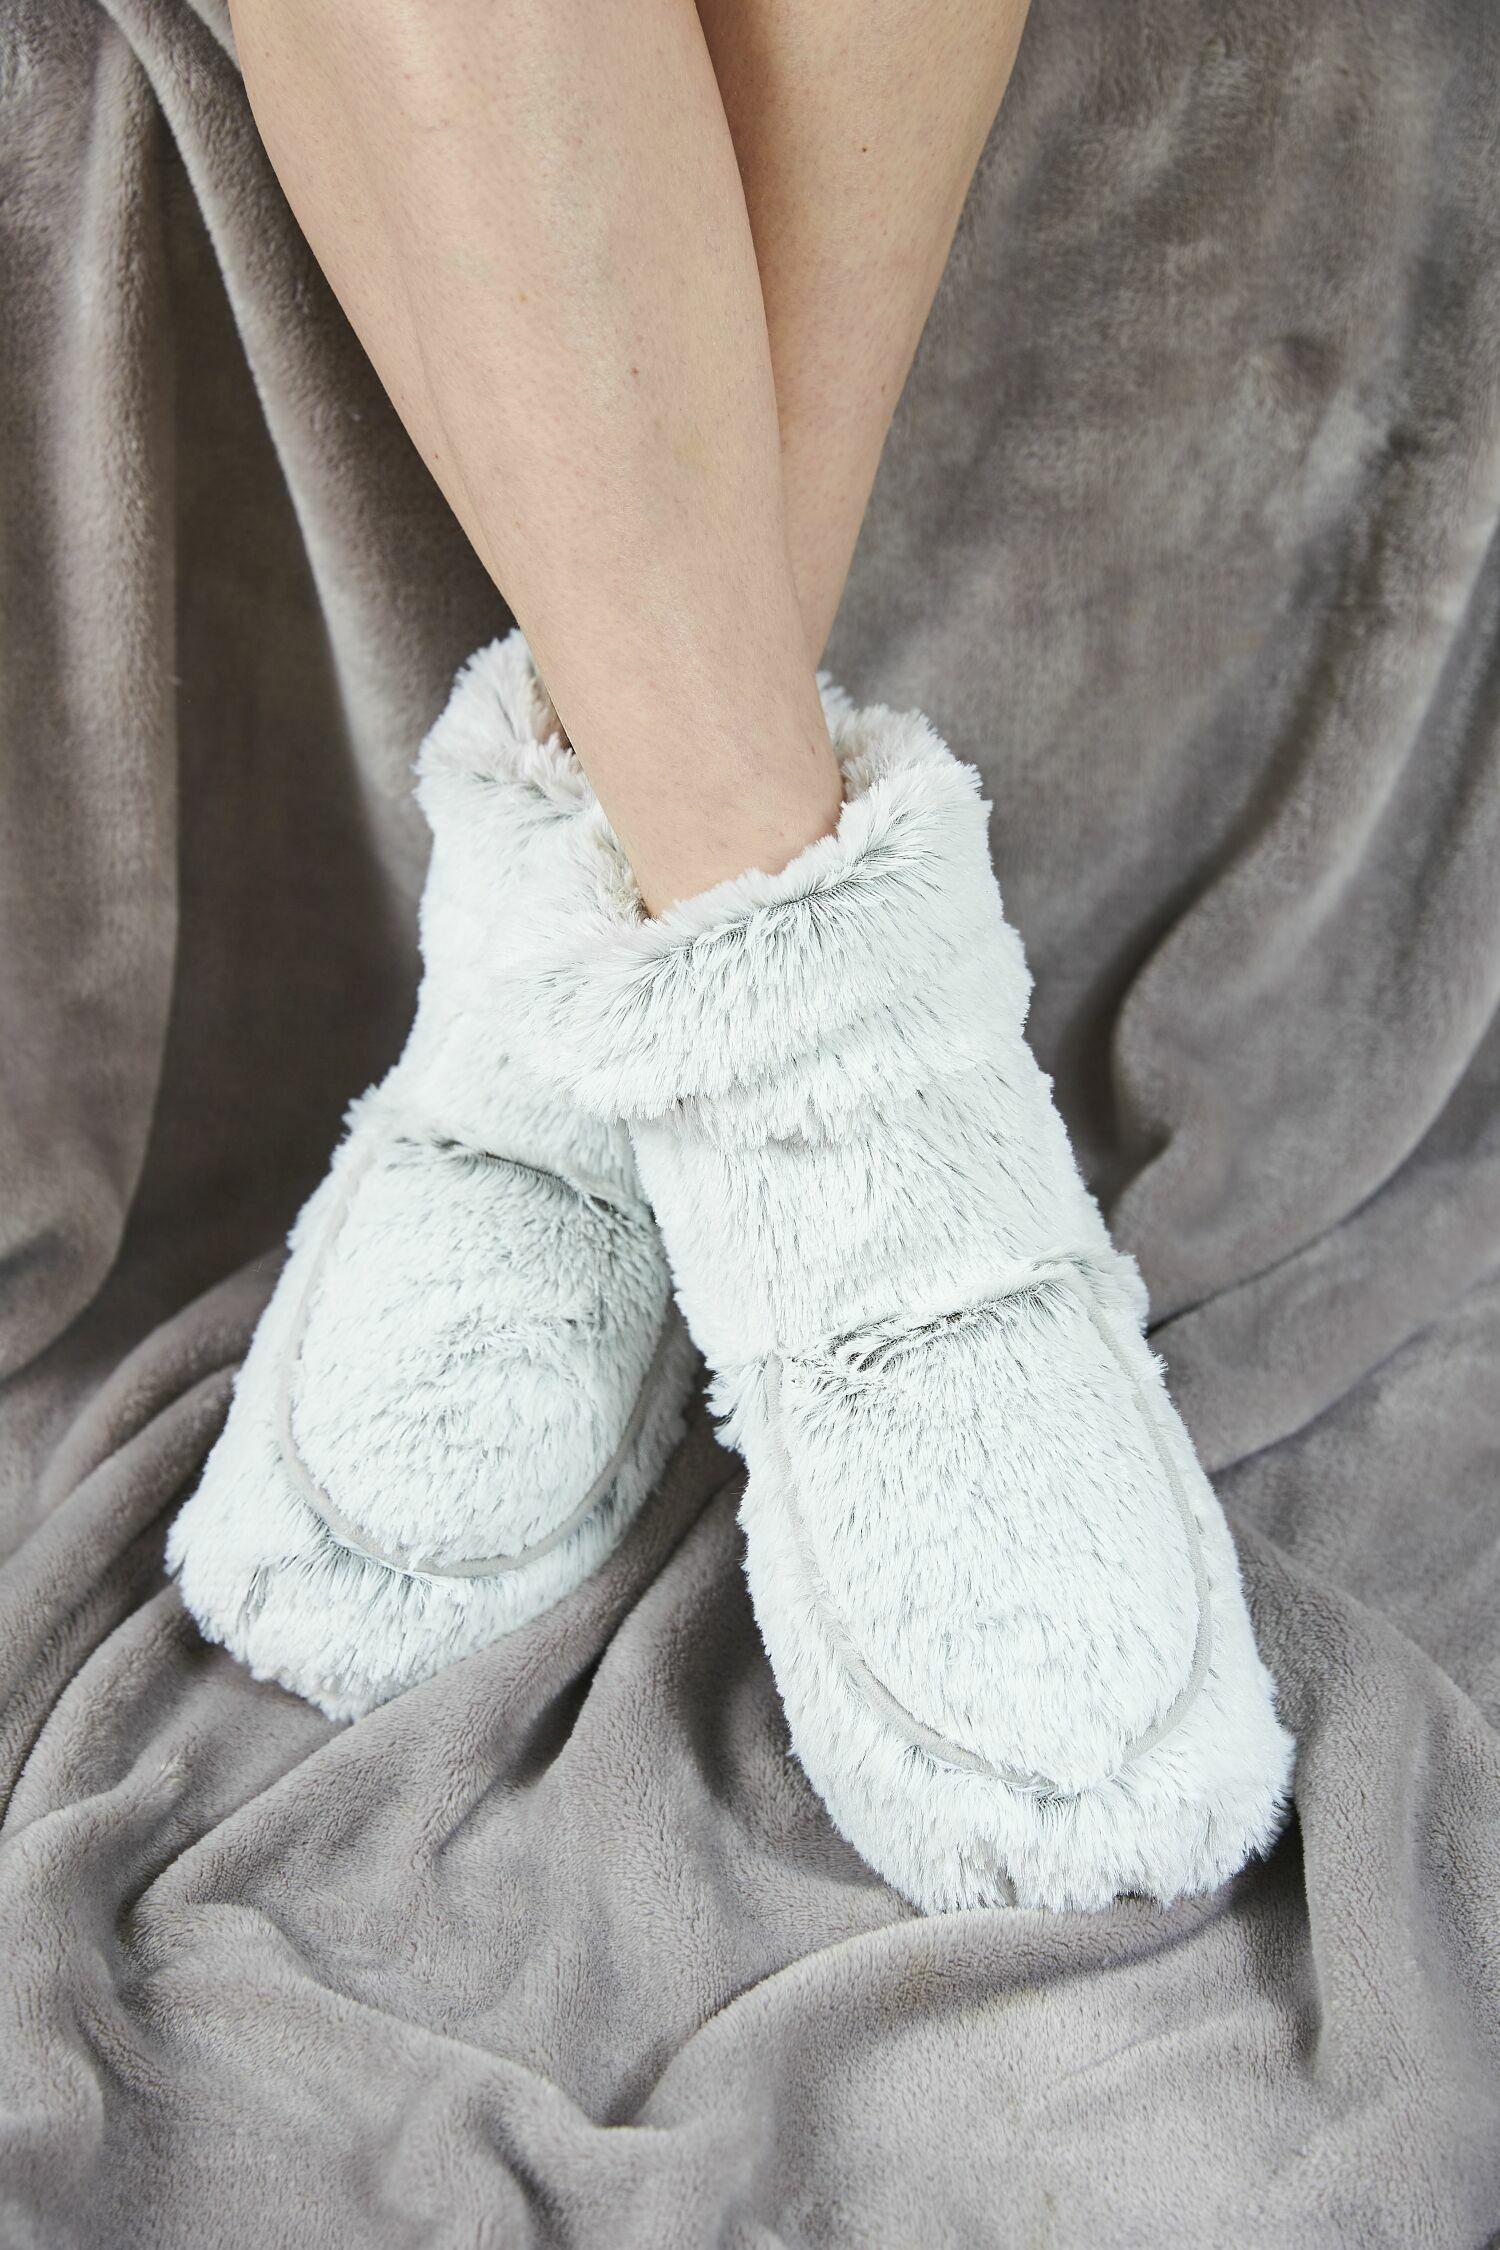 Пинкл (Pinkl) | Сапожки-грелки серые Marshmallow | Intelex Ltd Warmies Cozy Body Grey Marshmallow Boots